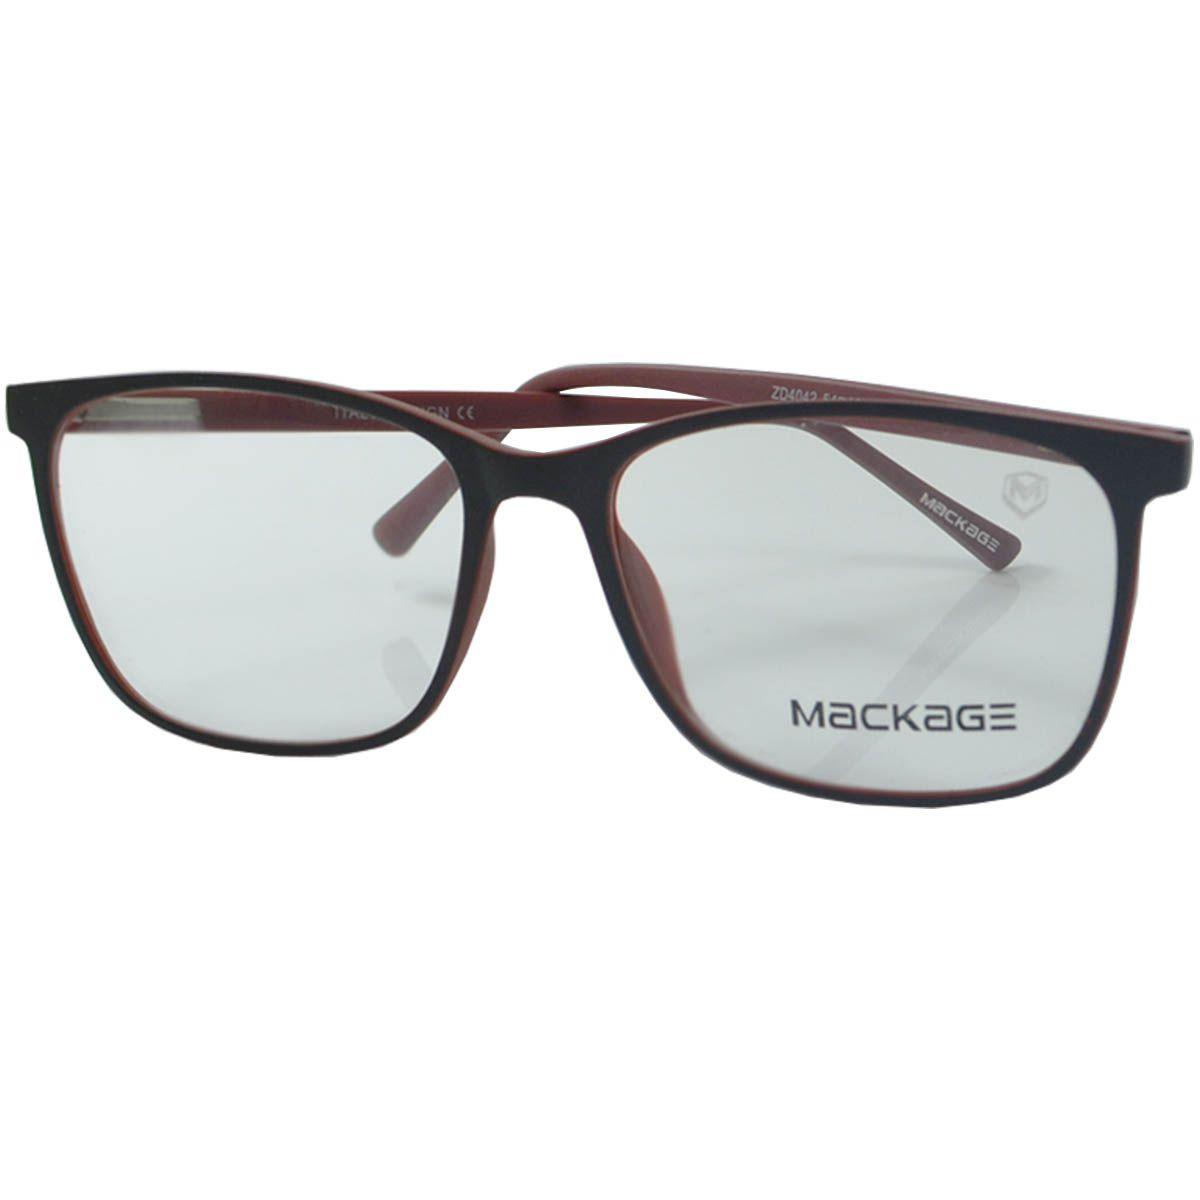 41f0c697449db Óculos Mackage - Armação MKA4042C4 Preto Vermelho